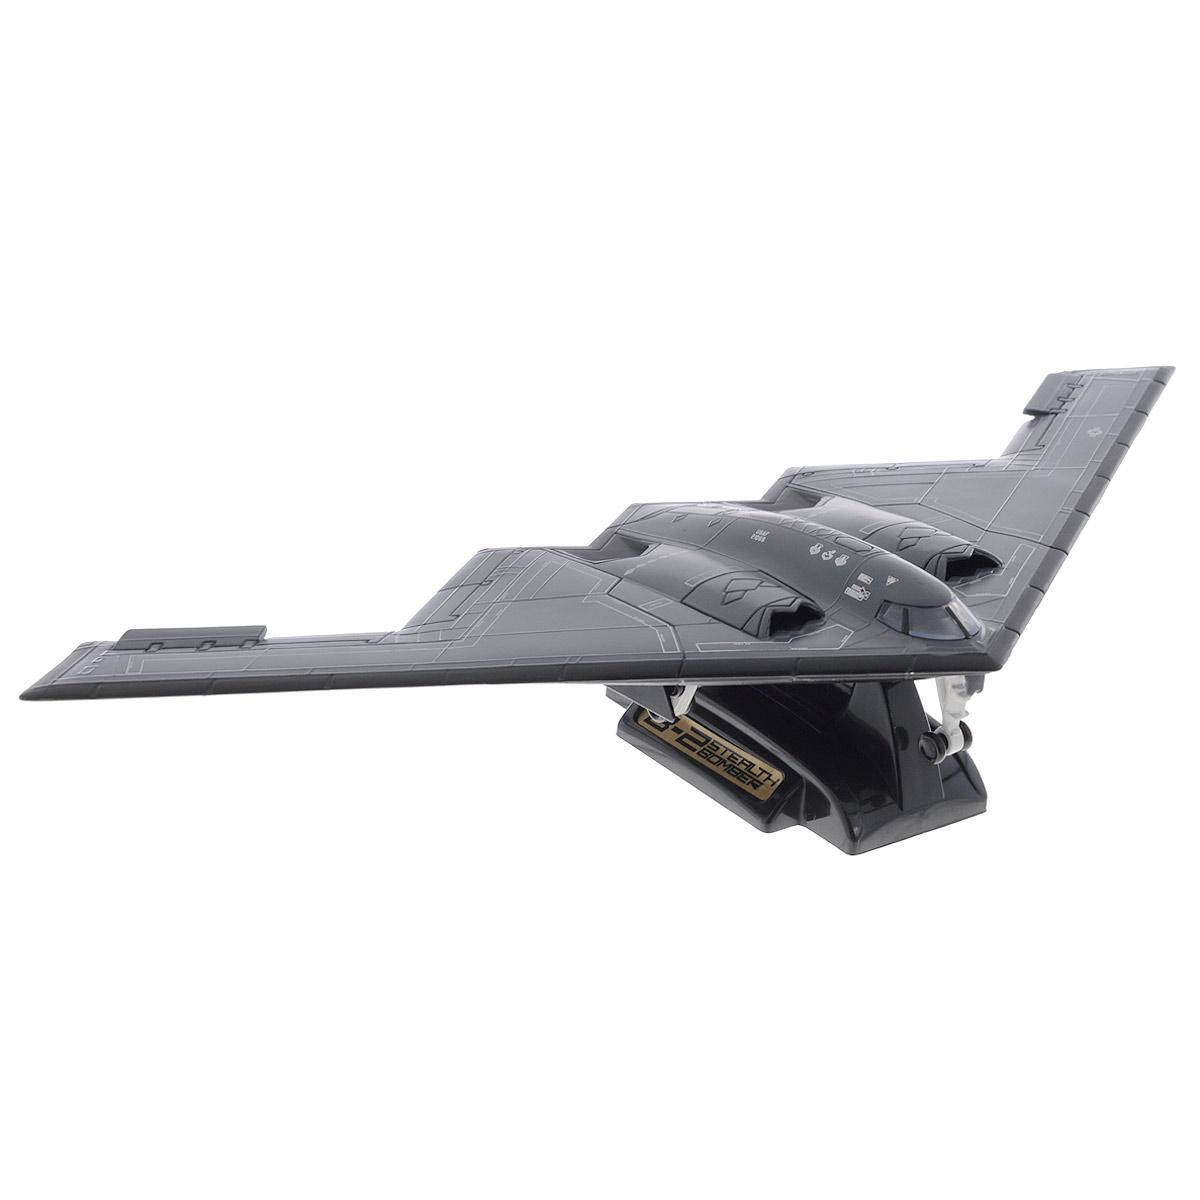 MotorMax Самолет Northrop Grumman B-2 Spirit motormax коллекционная модель мотоцикла kawasaki vulcan цвет синий серебристый масштаб 1 18